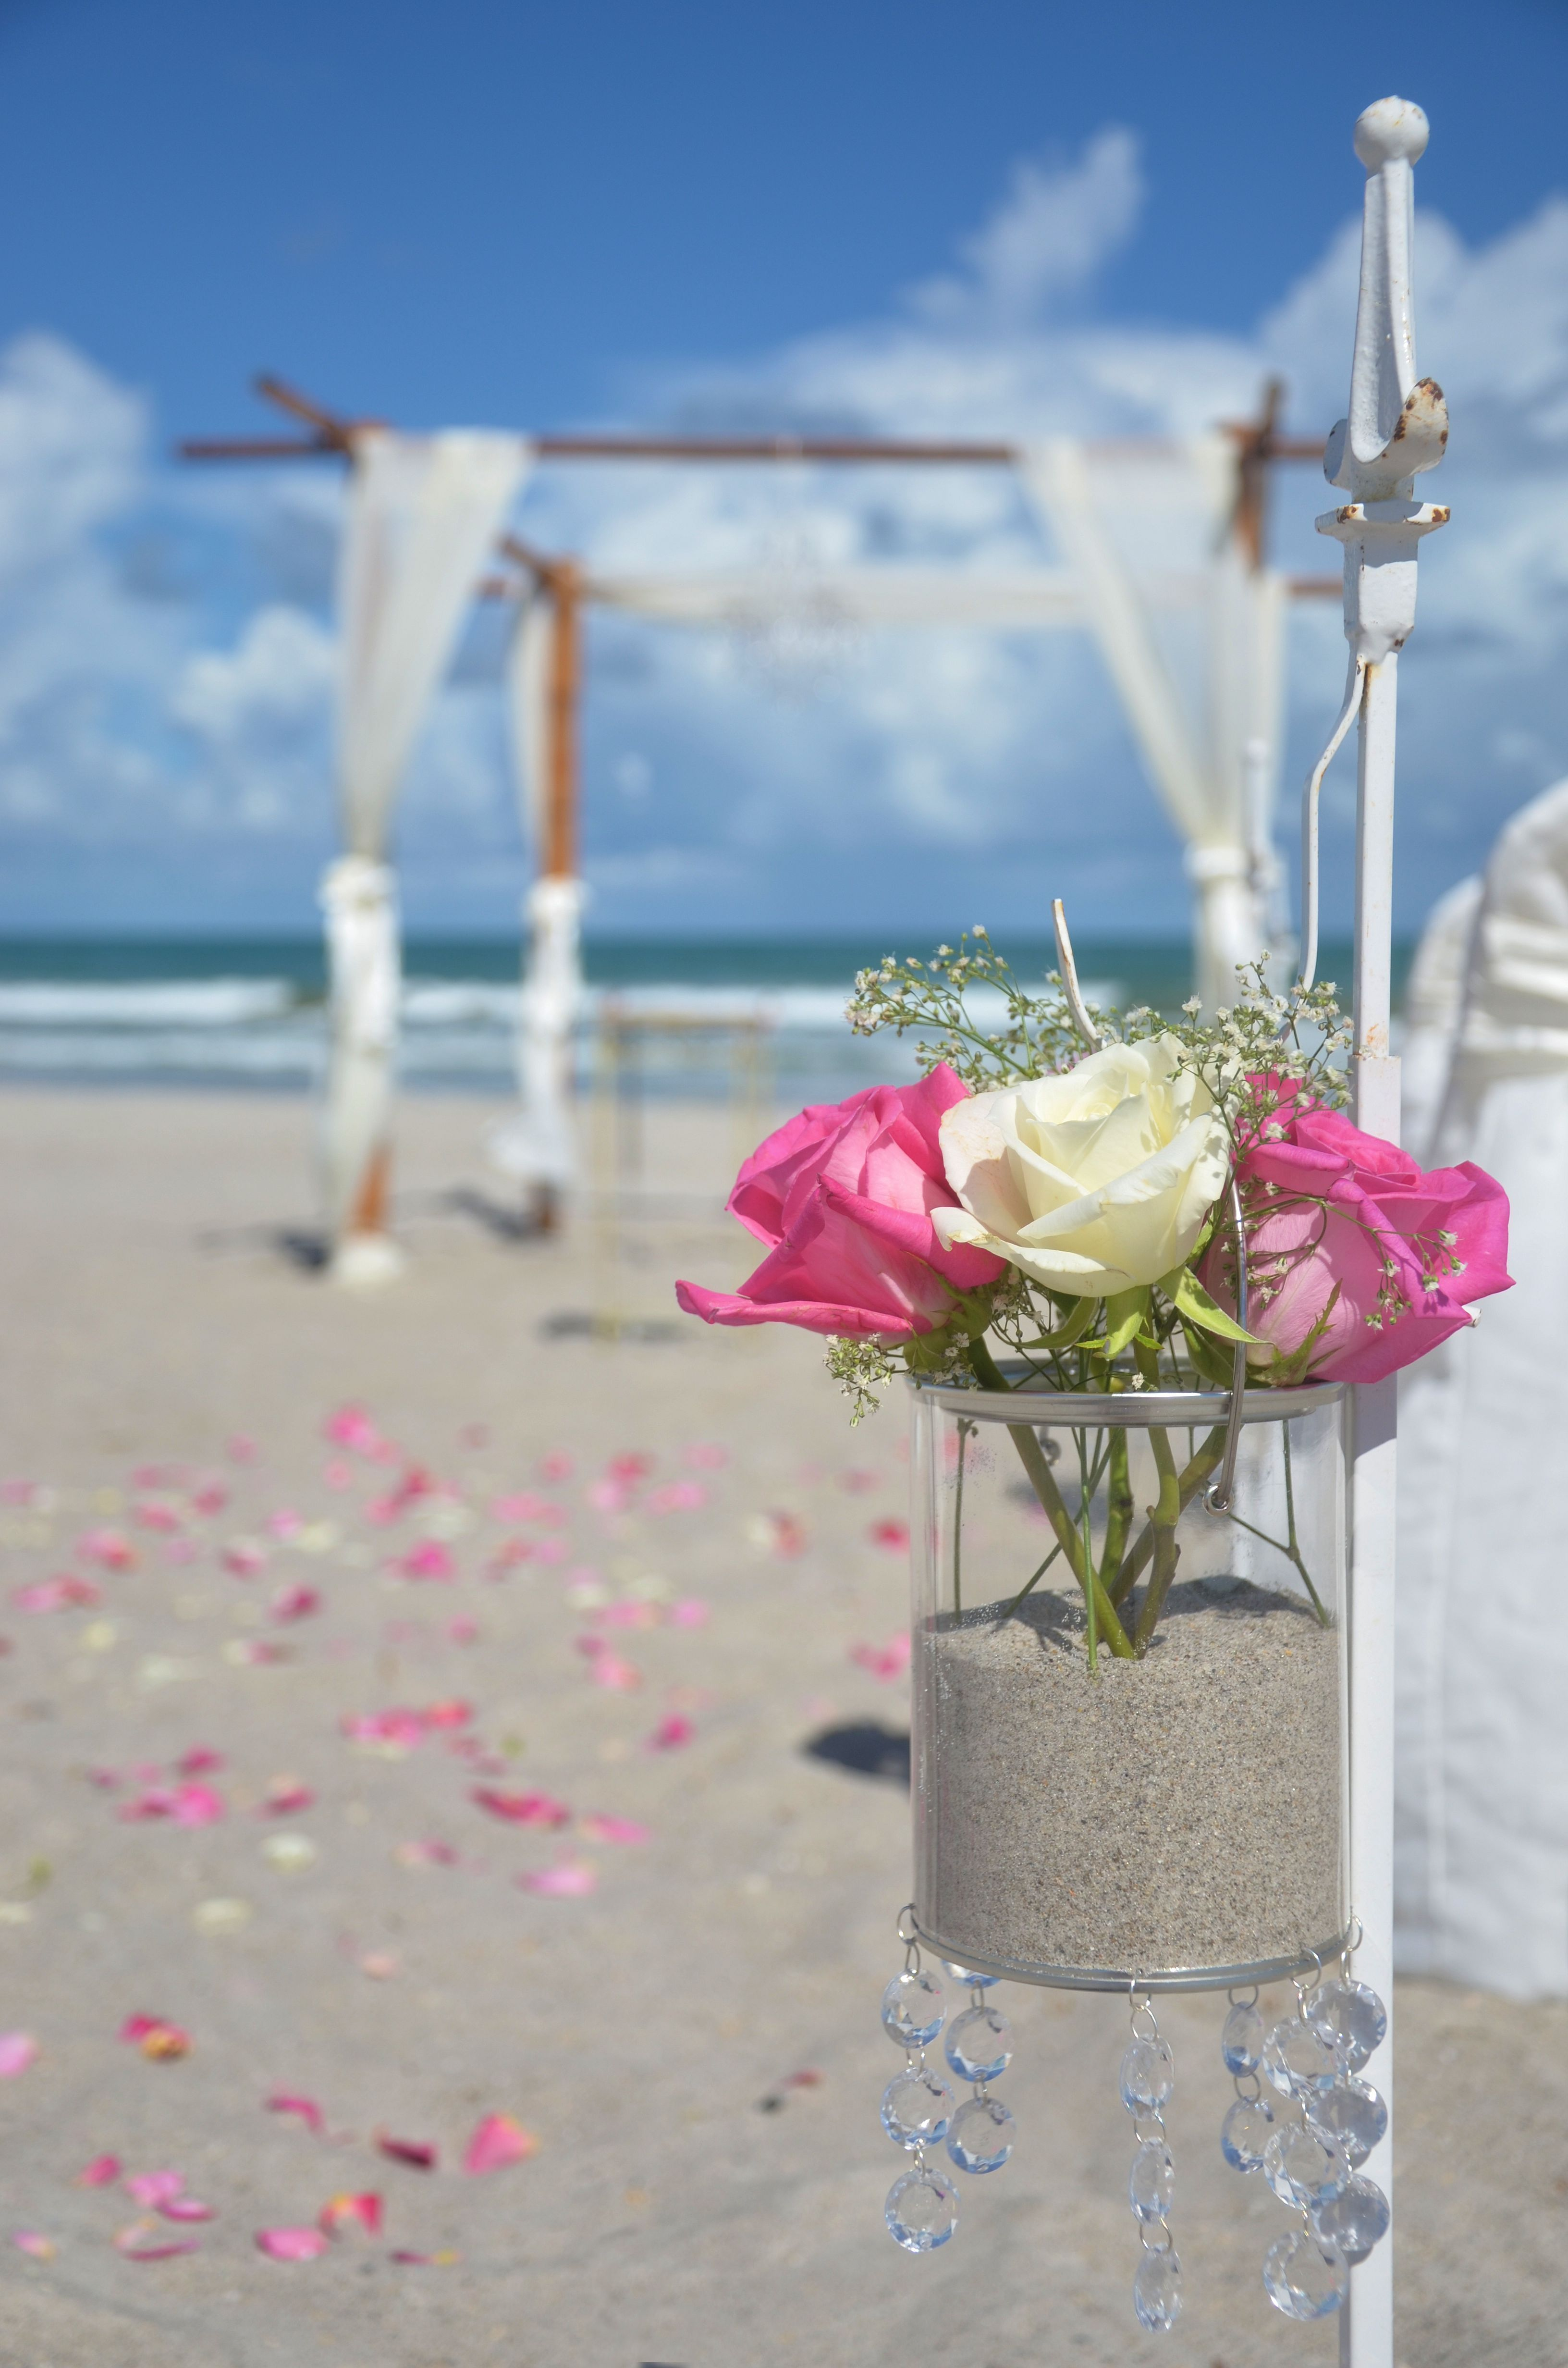 Vintage Beach Wedding Setup With Hanging Crystal Vases CentralFloridaWeddingGroup